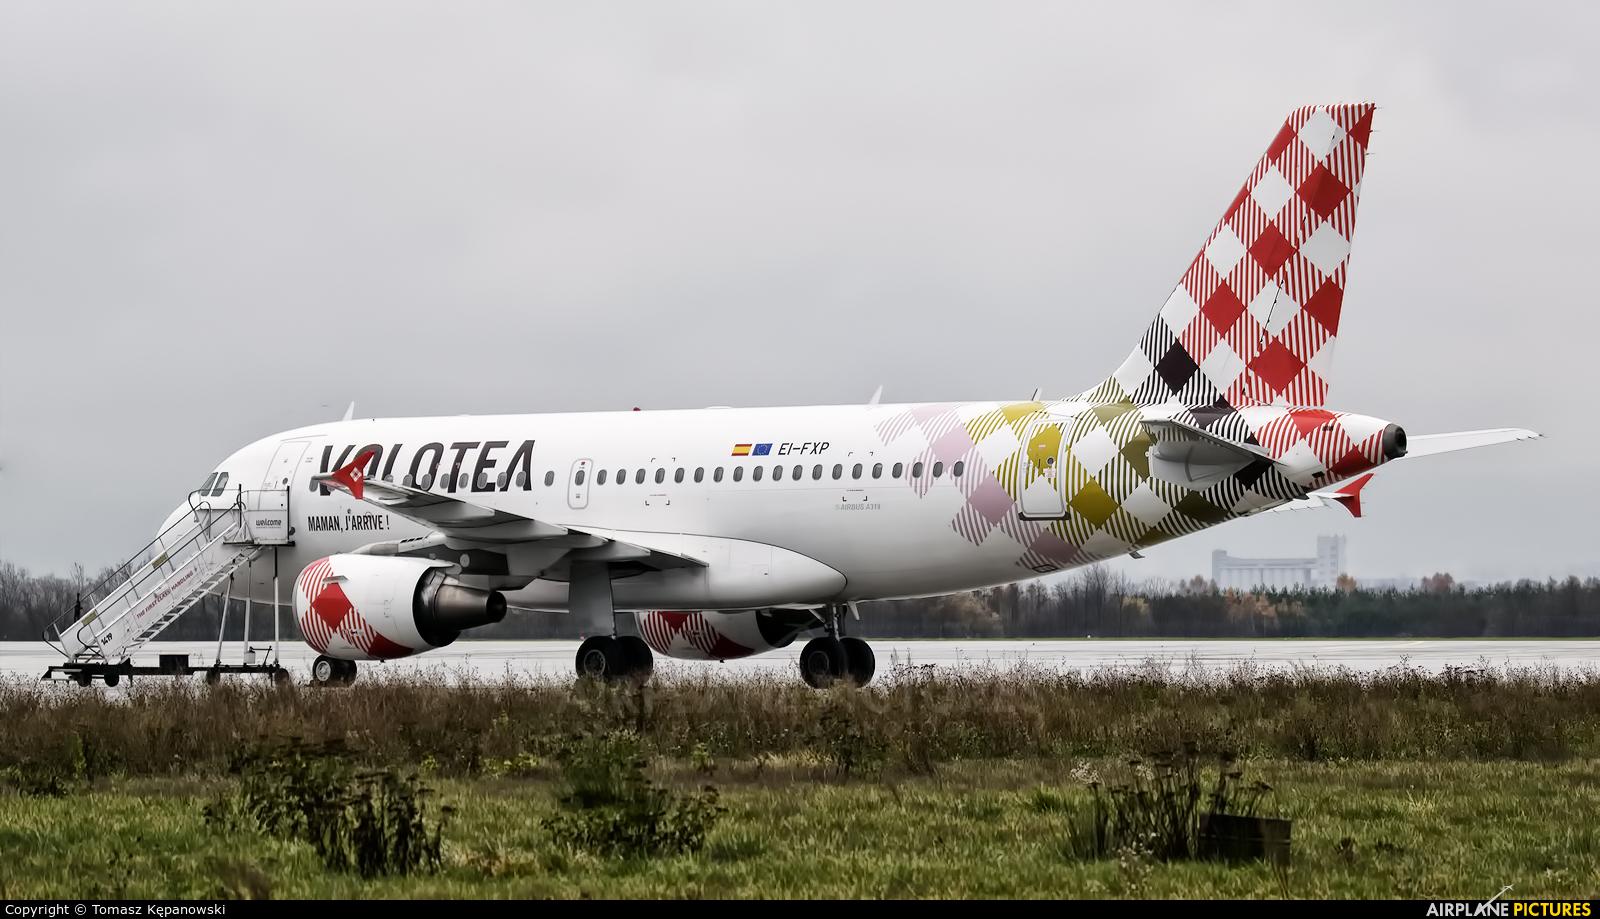 Volotea Airlines EI-FXP aircraft at Rzeszów-Jasionka